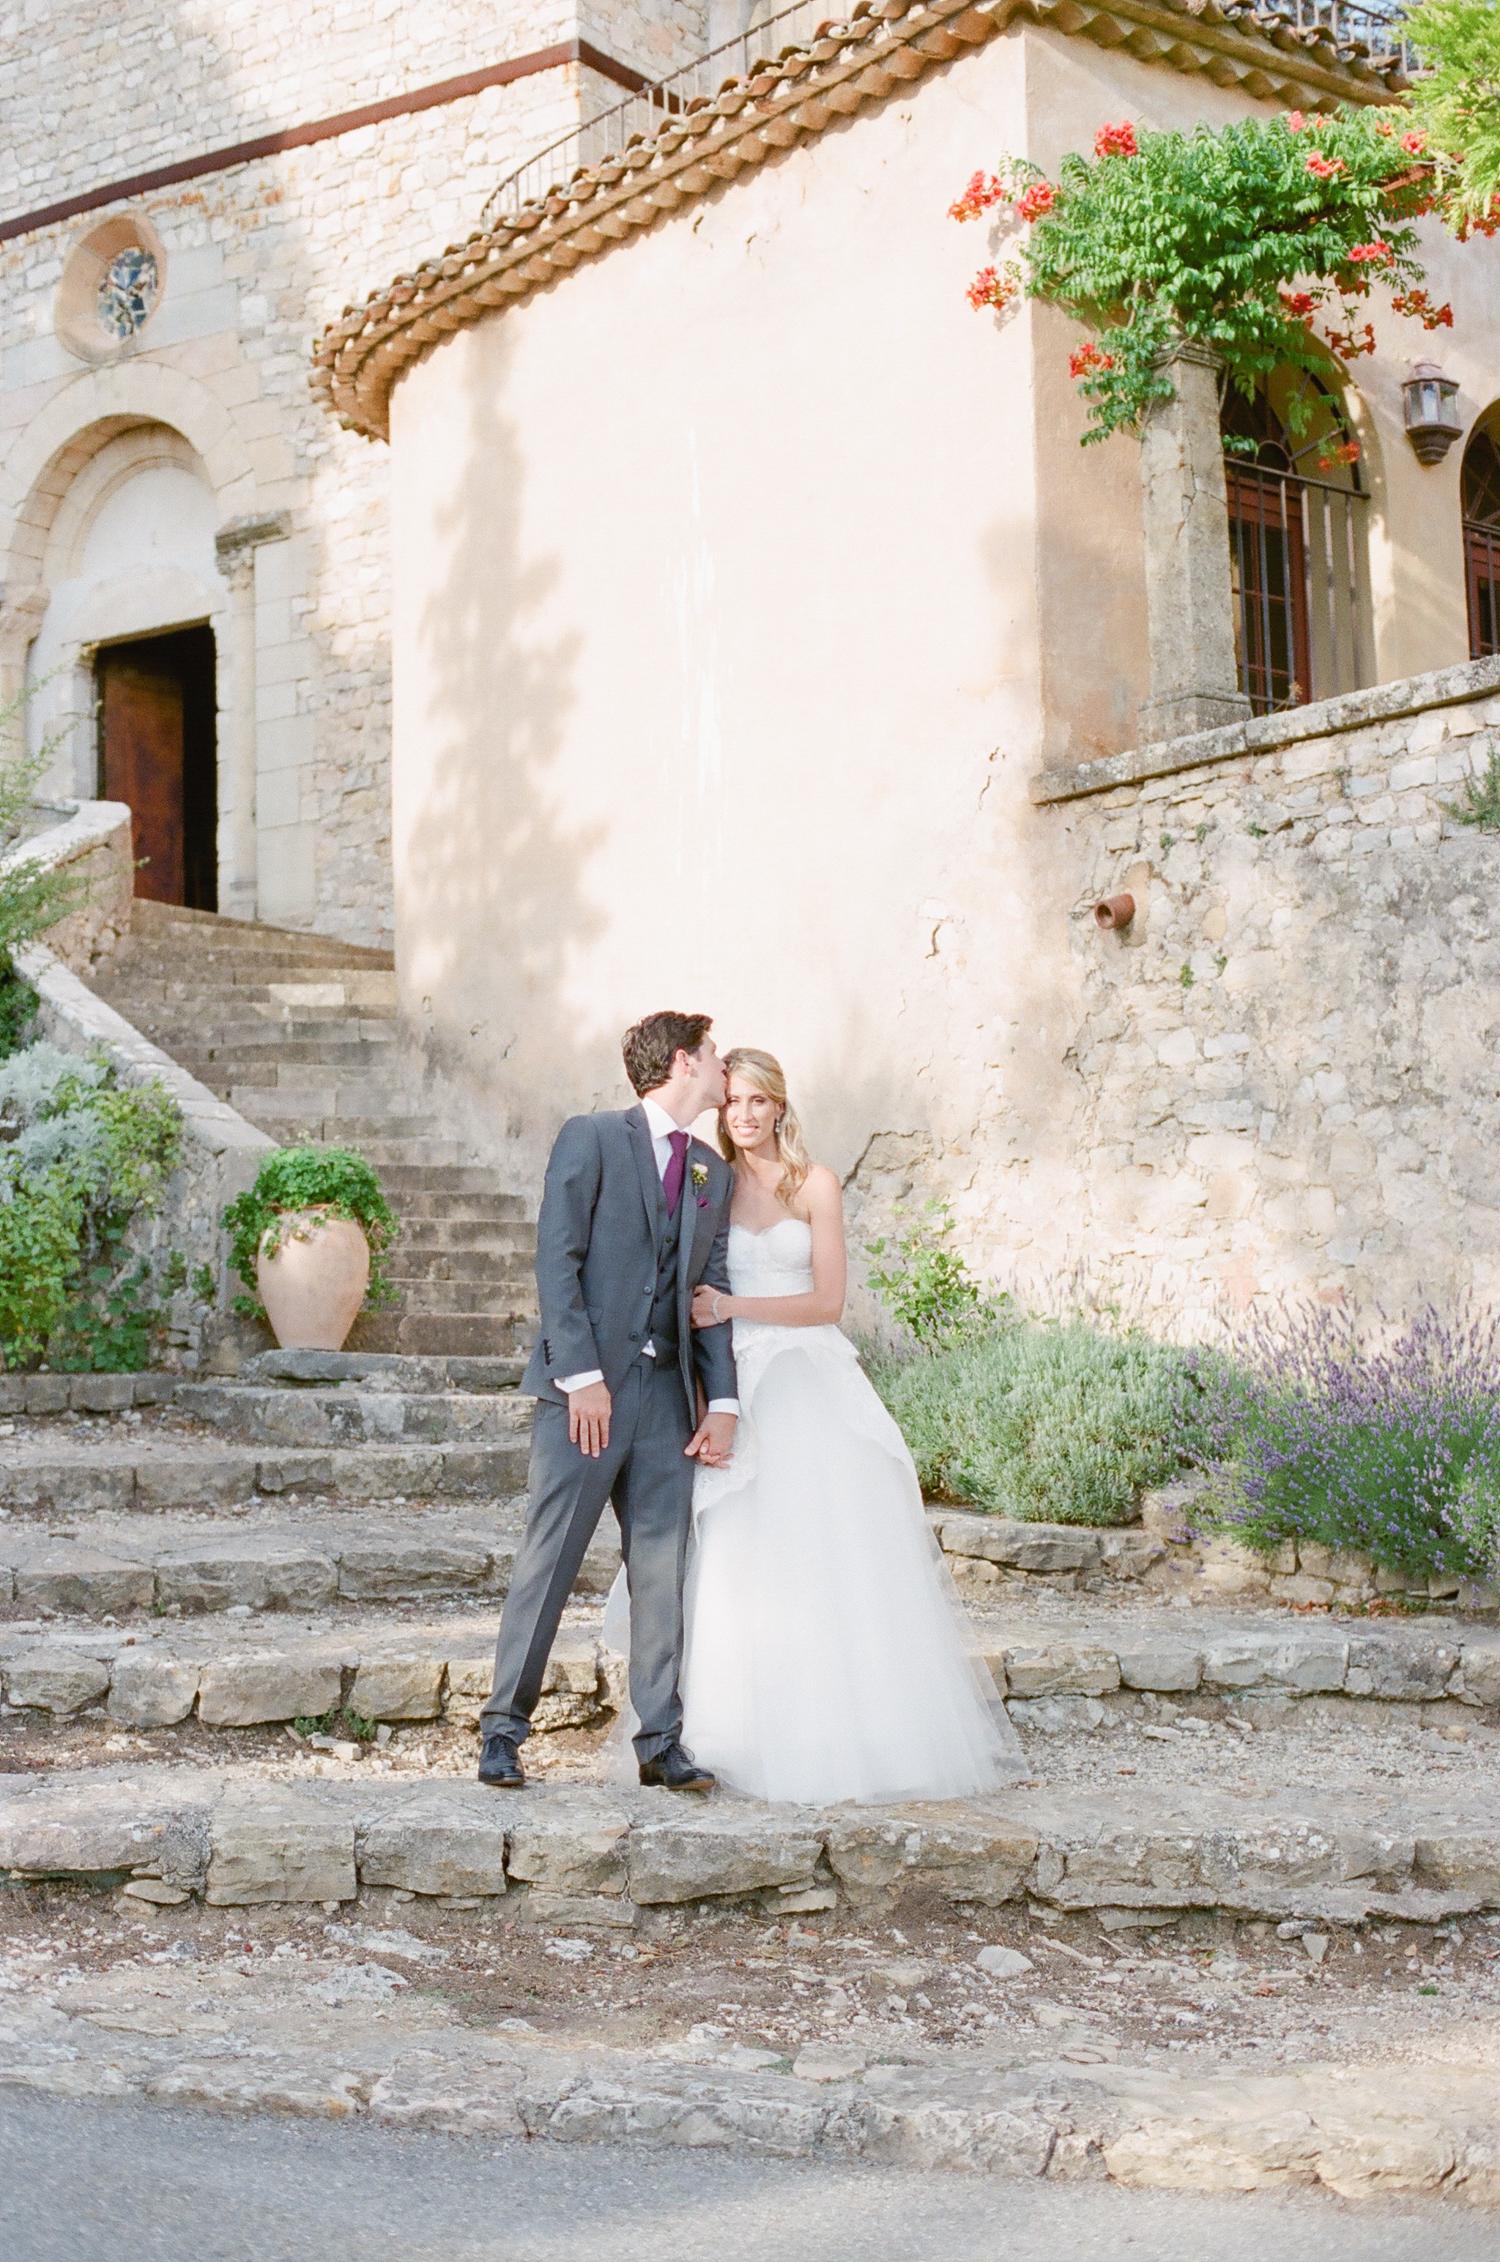 French_Wedding_(c)_Rory_Wylie-48.jpg